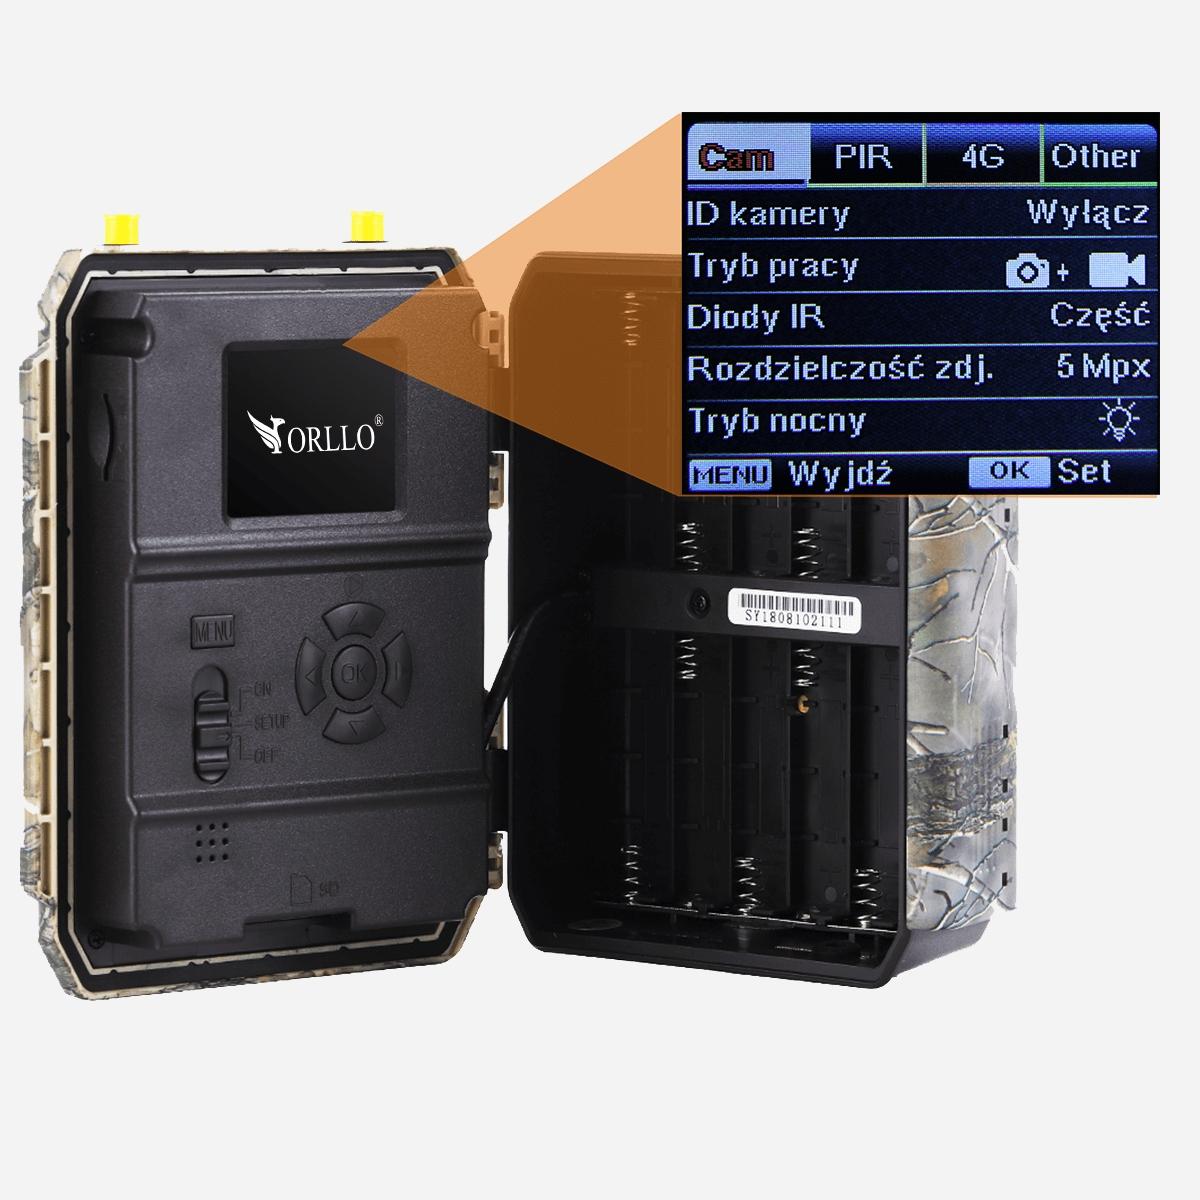 Fotopułapka Kamera Leśna SIM GSM GPS+Panel Solarny Model HUNTERCAM PRO